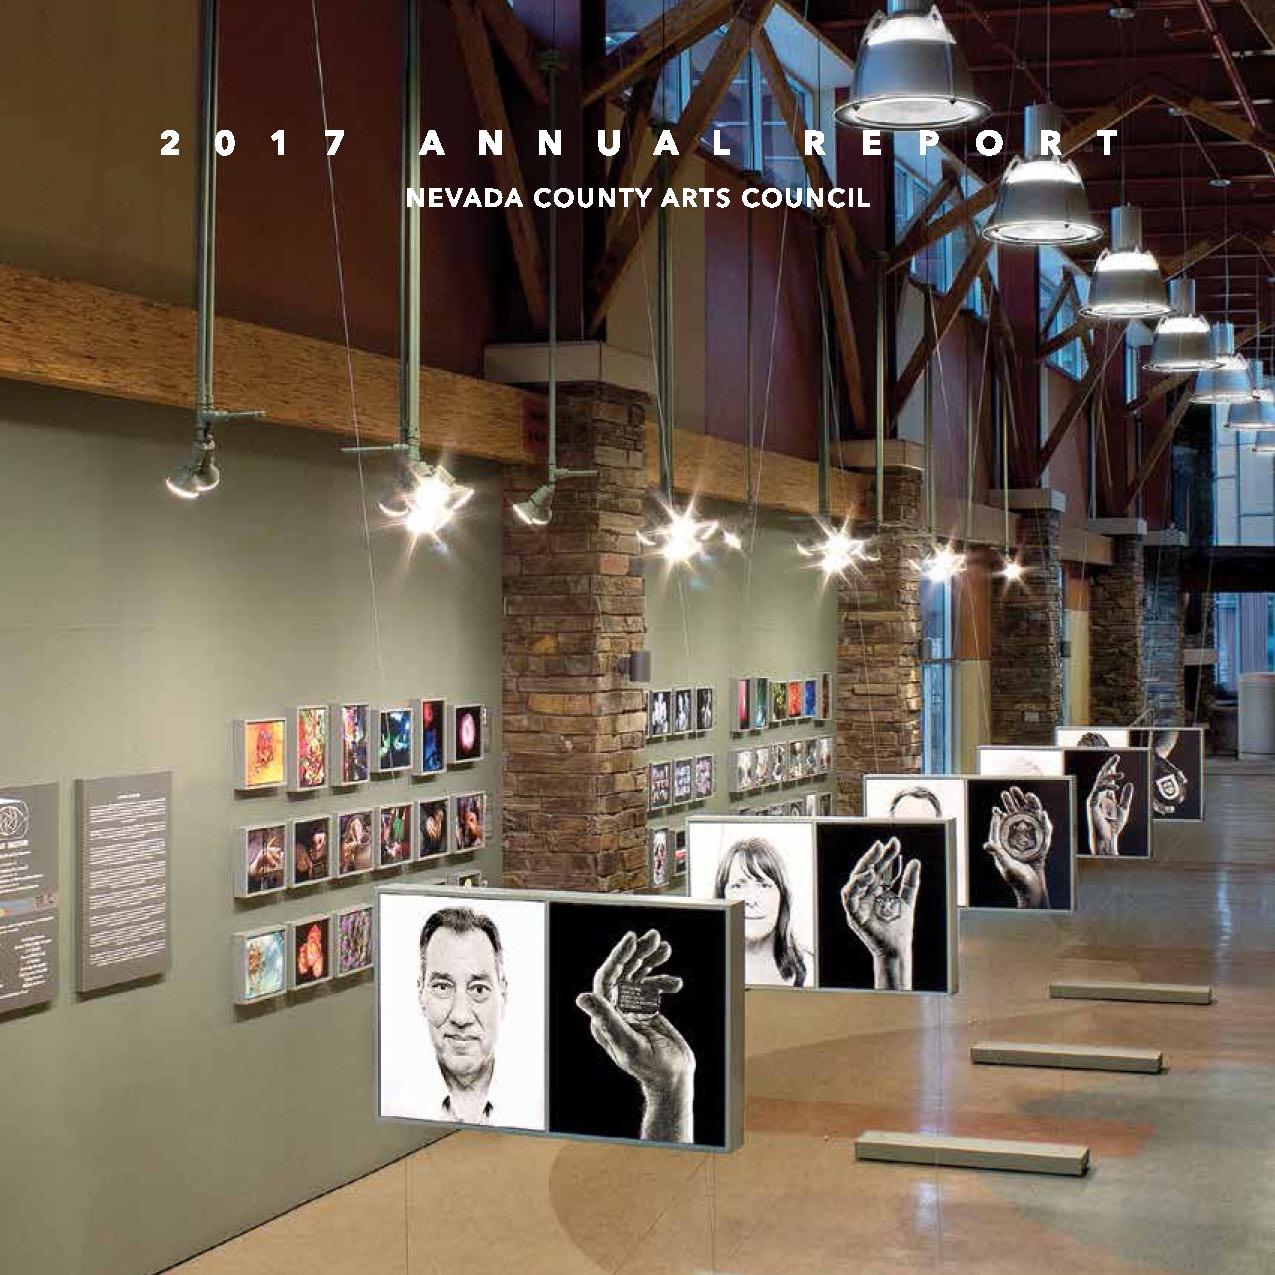 2017 Annual Report: Nevada County Arts Council